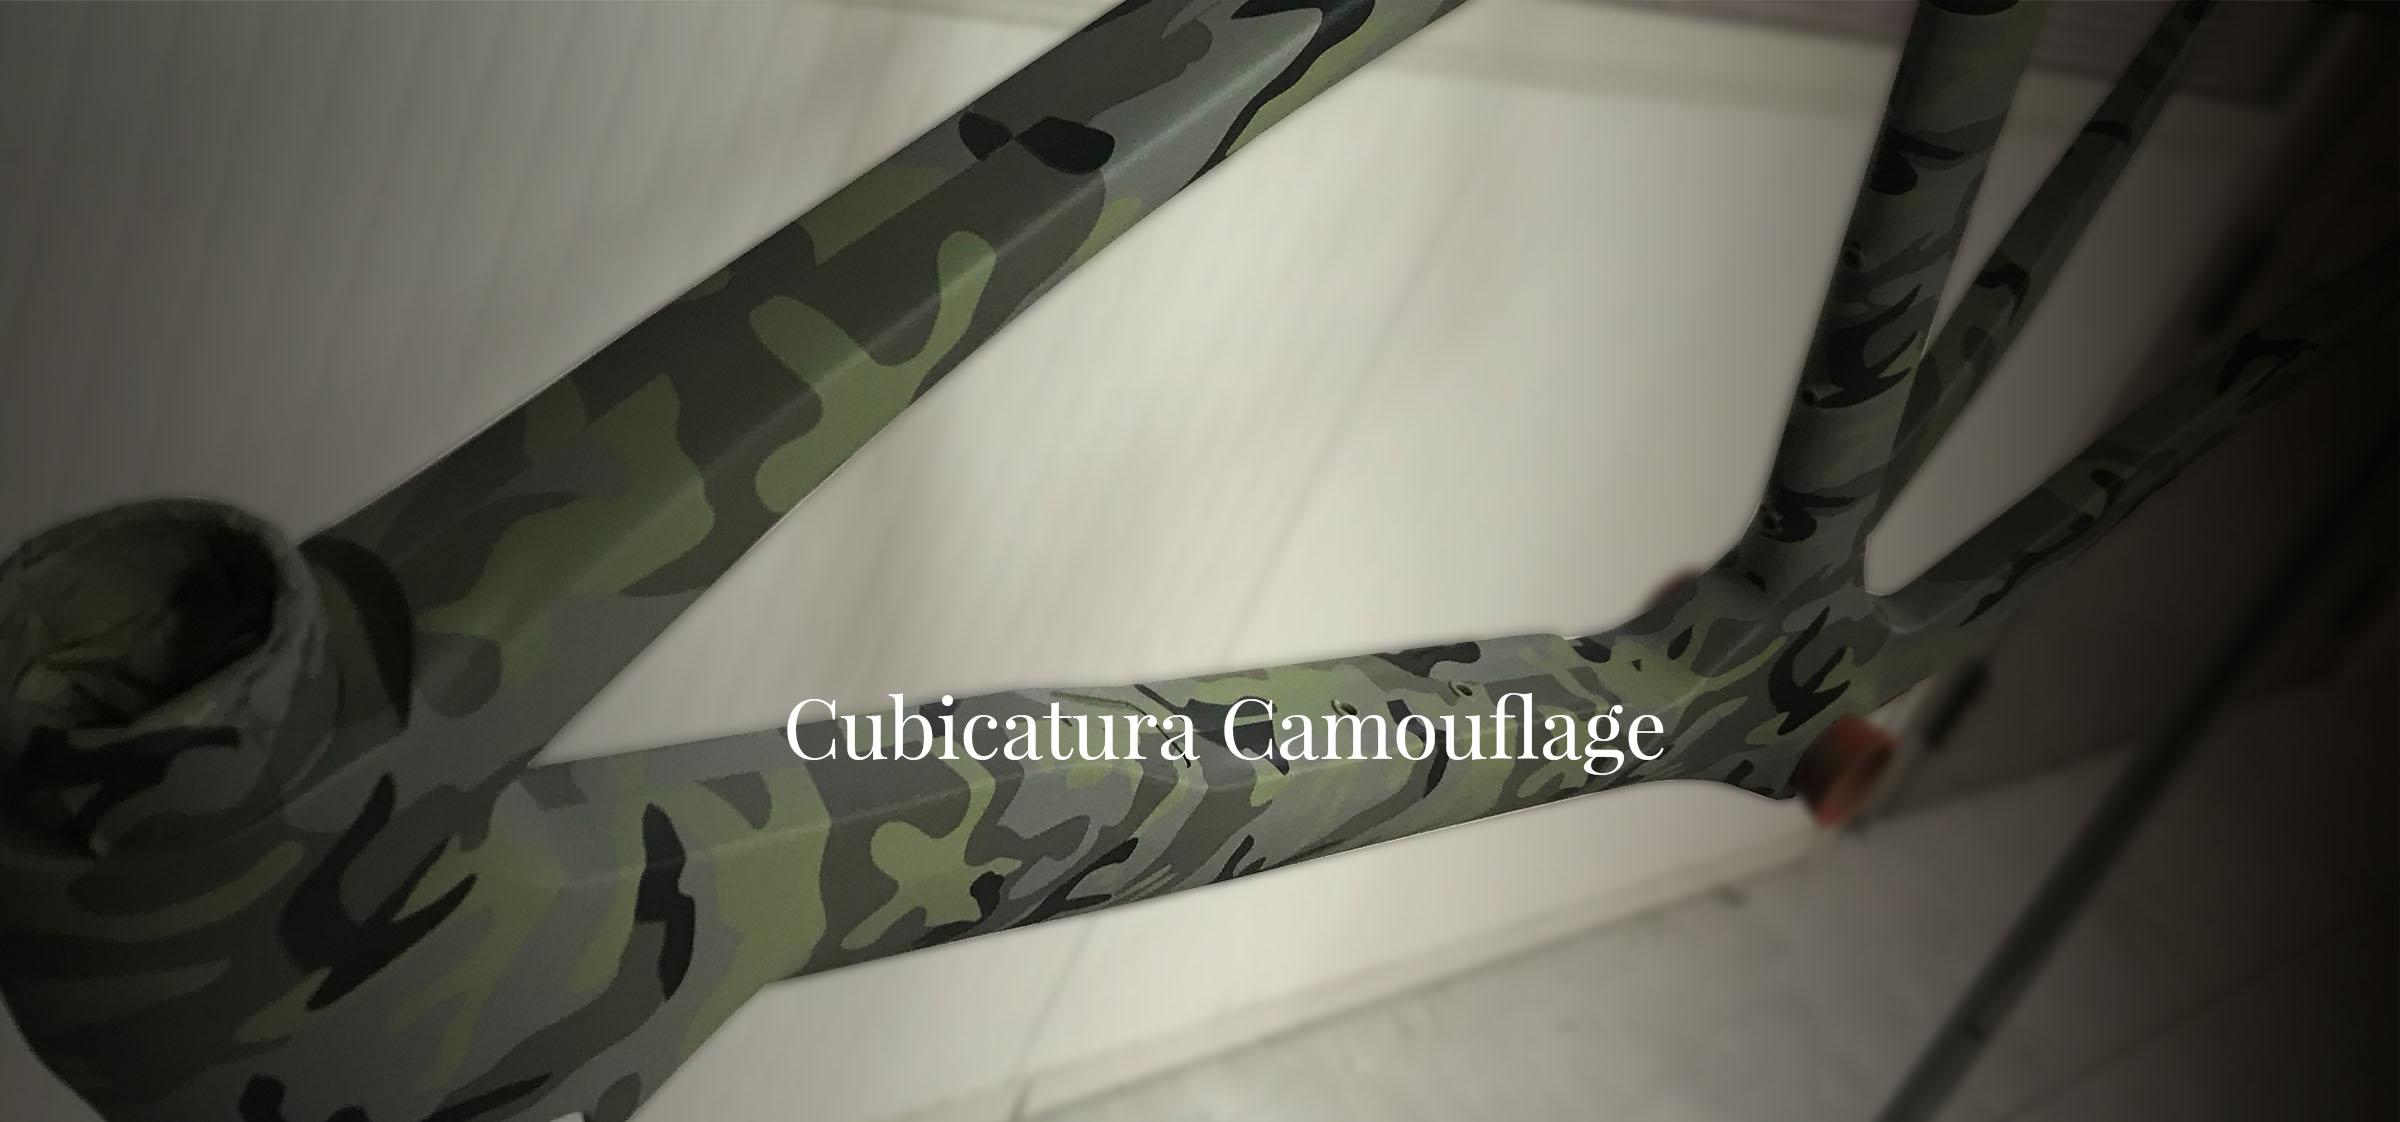 cubicatura-camouflage